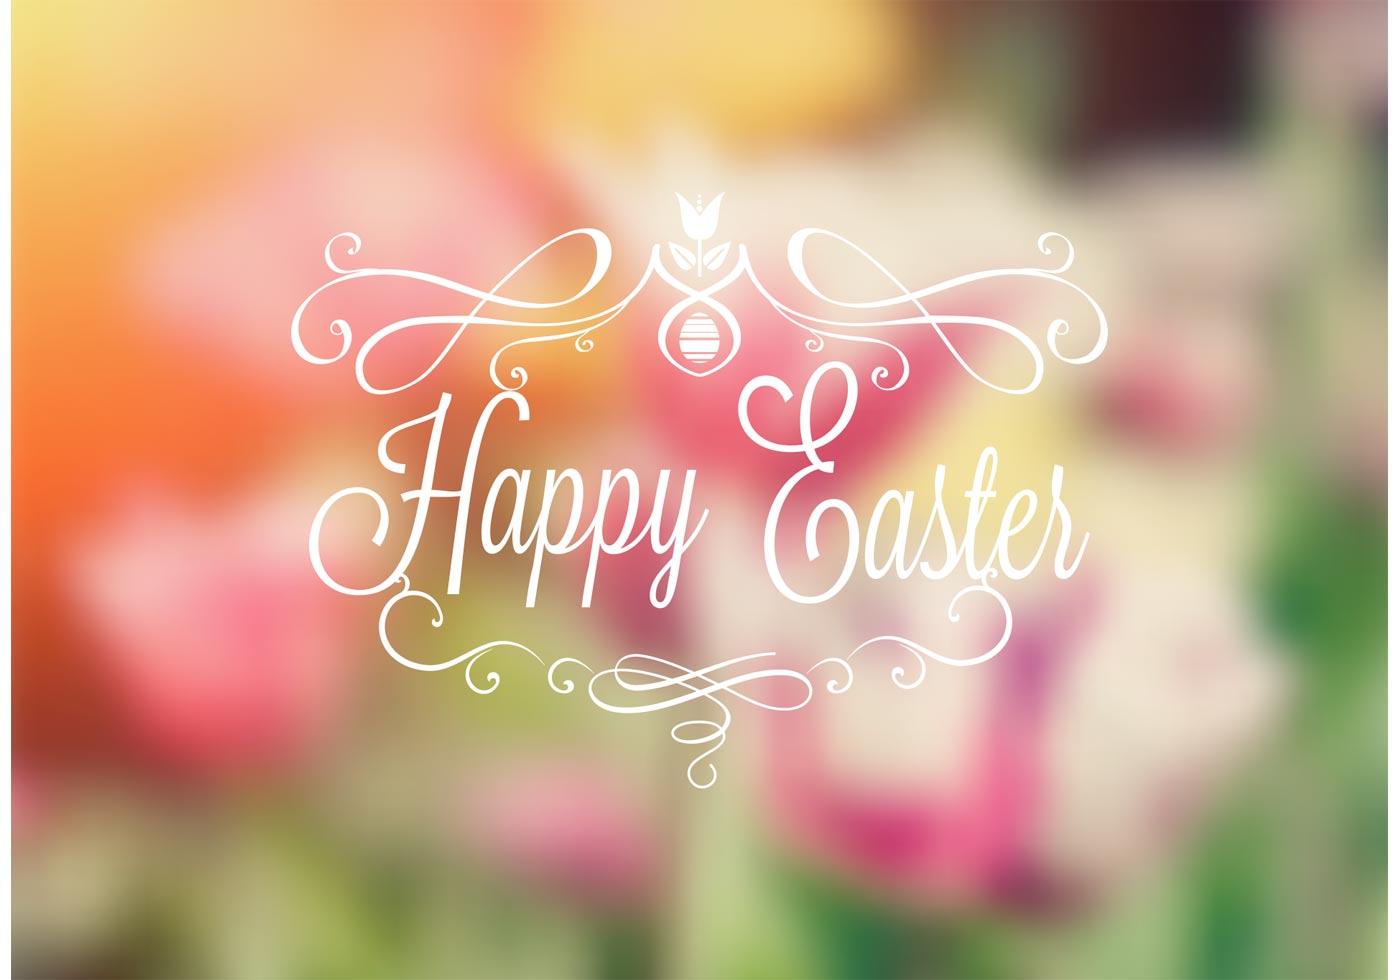 Free Download Happy Easter Typography Download Vectors Clipart